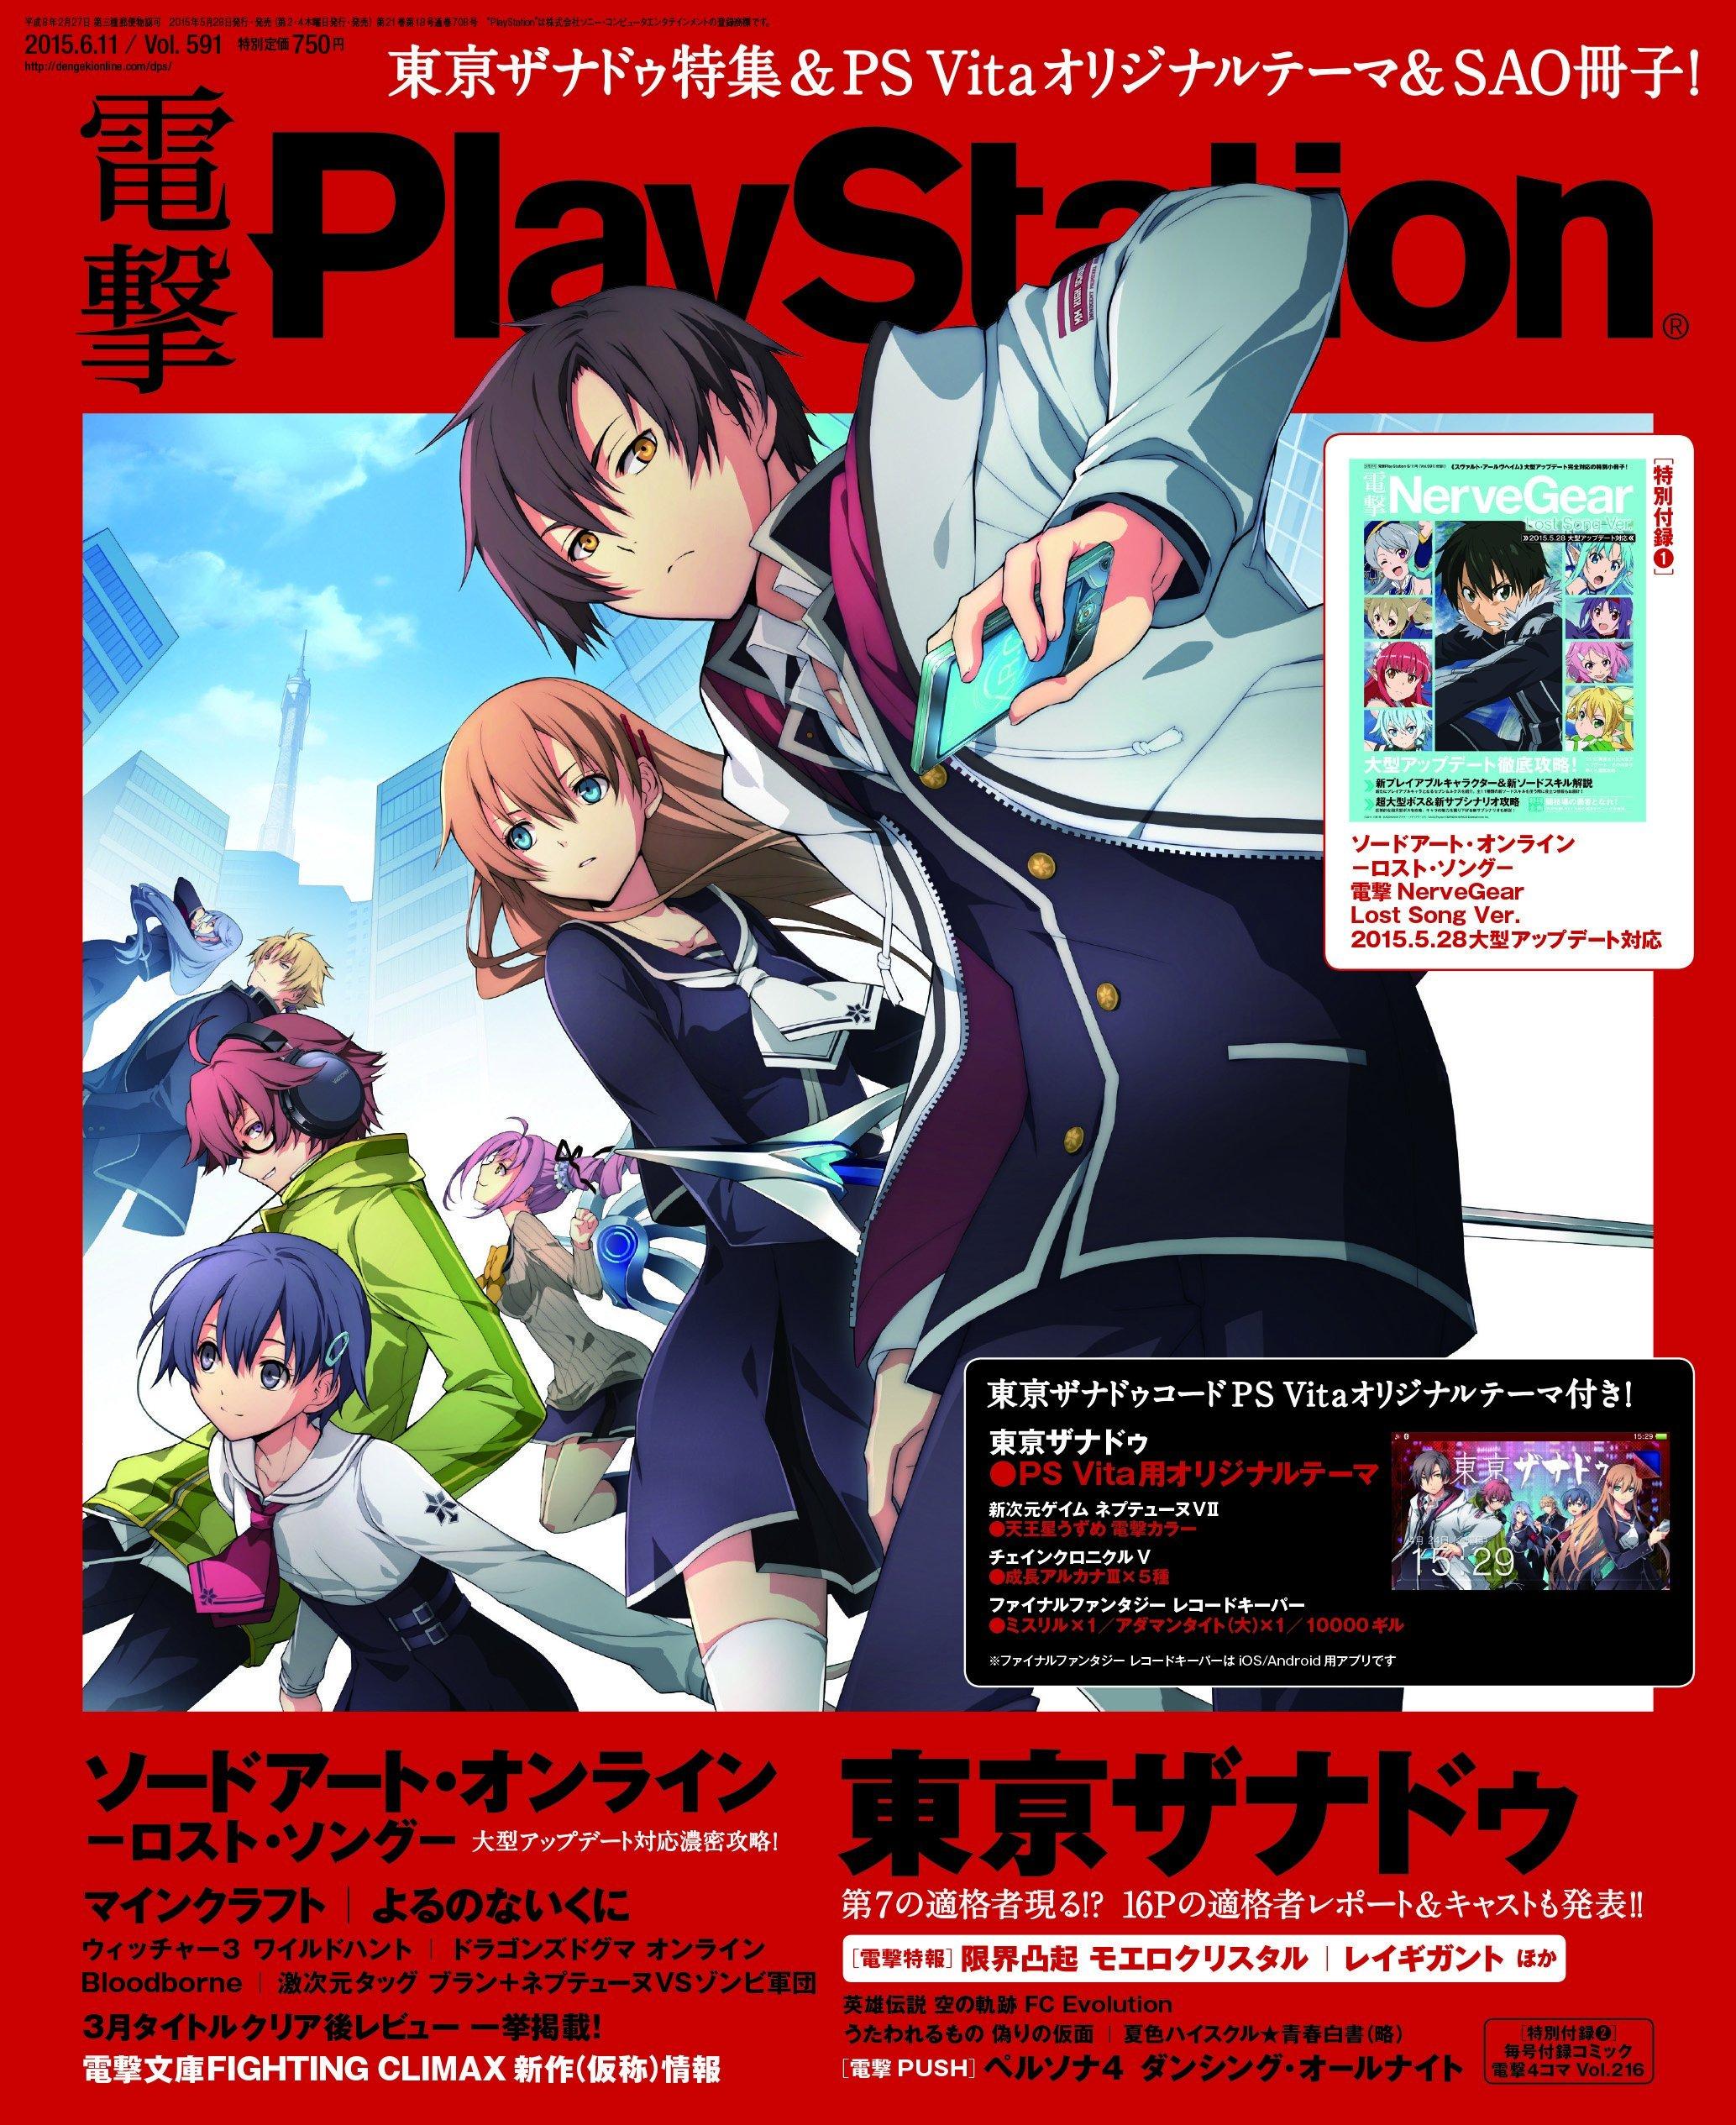 Dengeki PlayStation 591 (June 11, 2015)